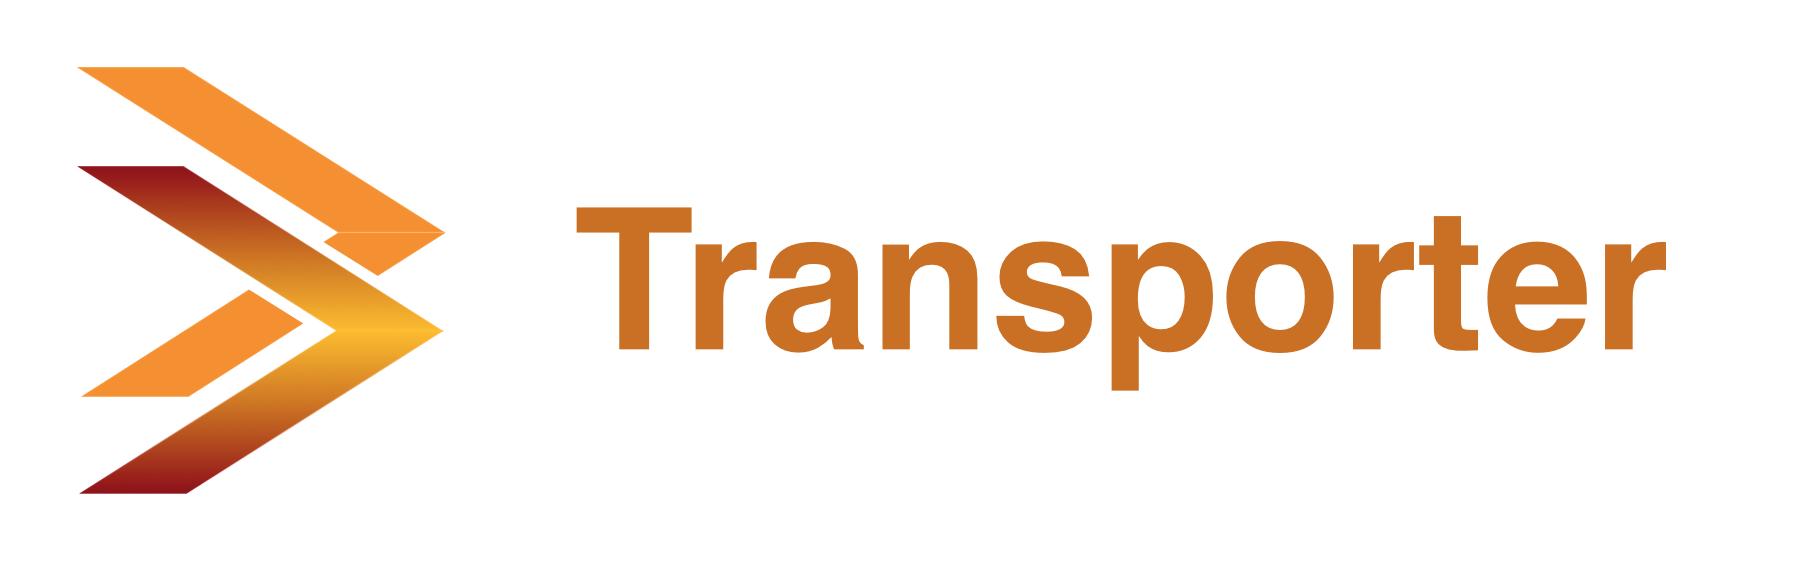 Transporter screenshot